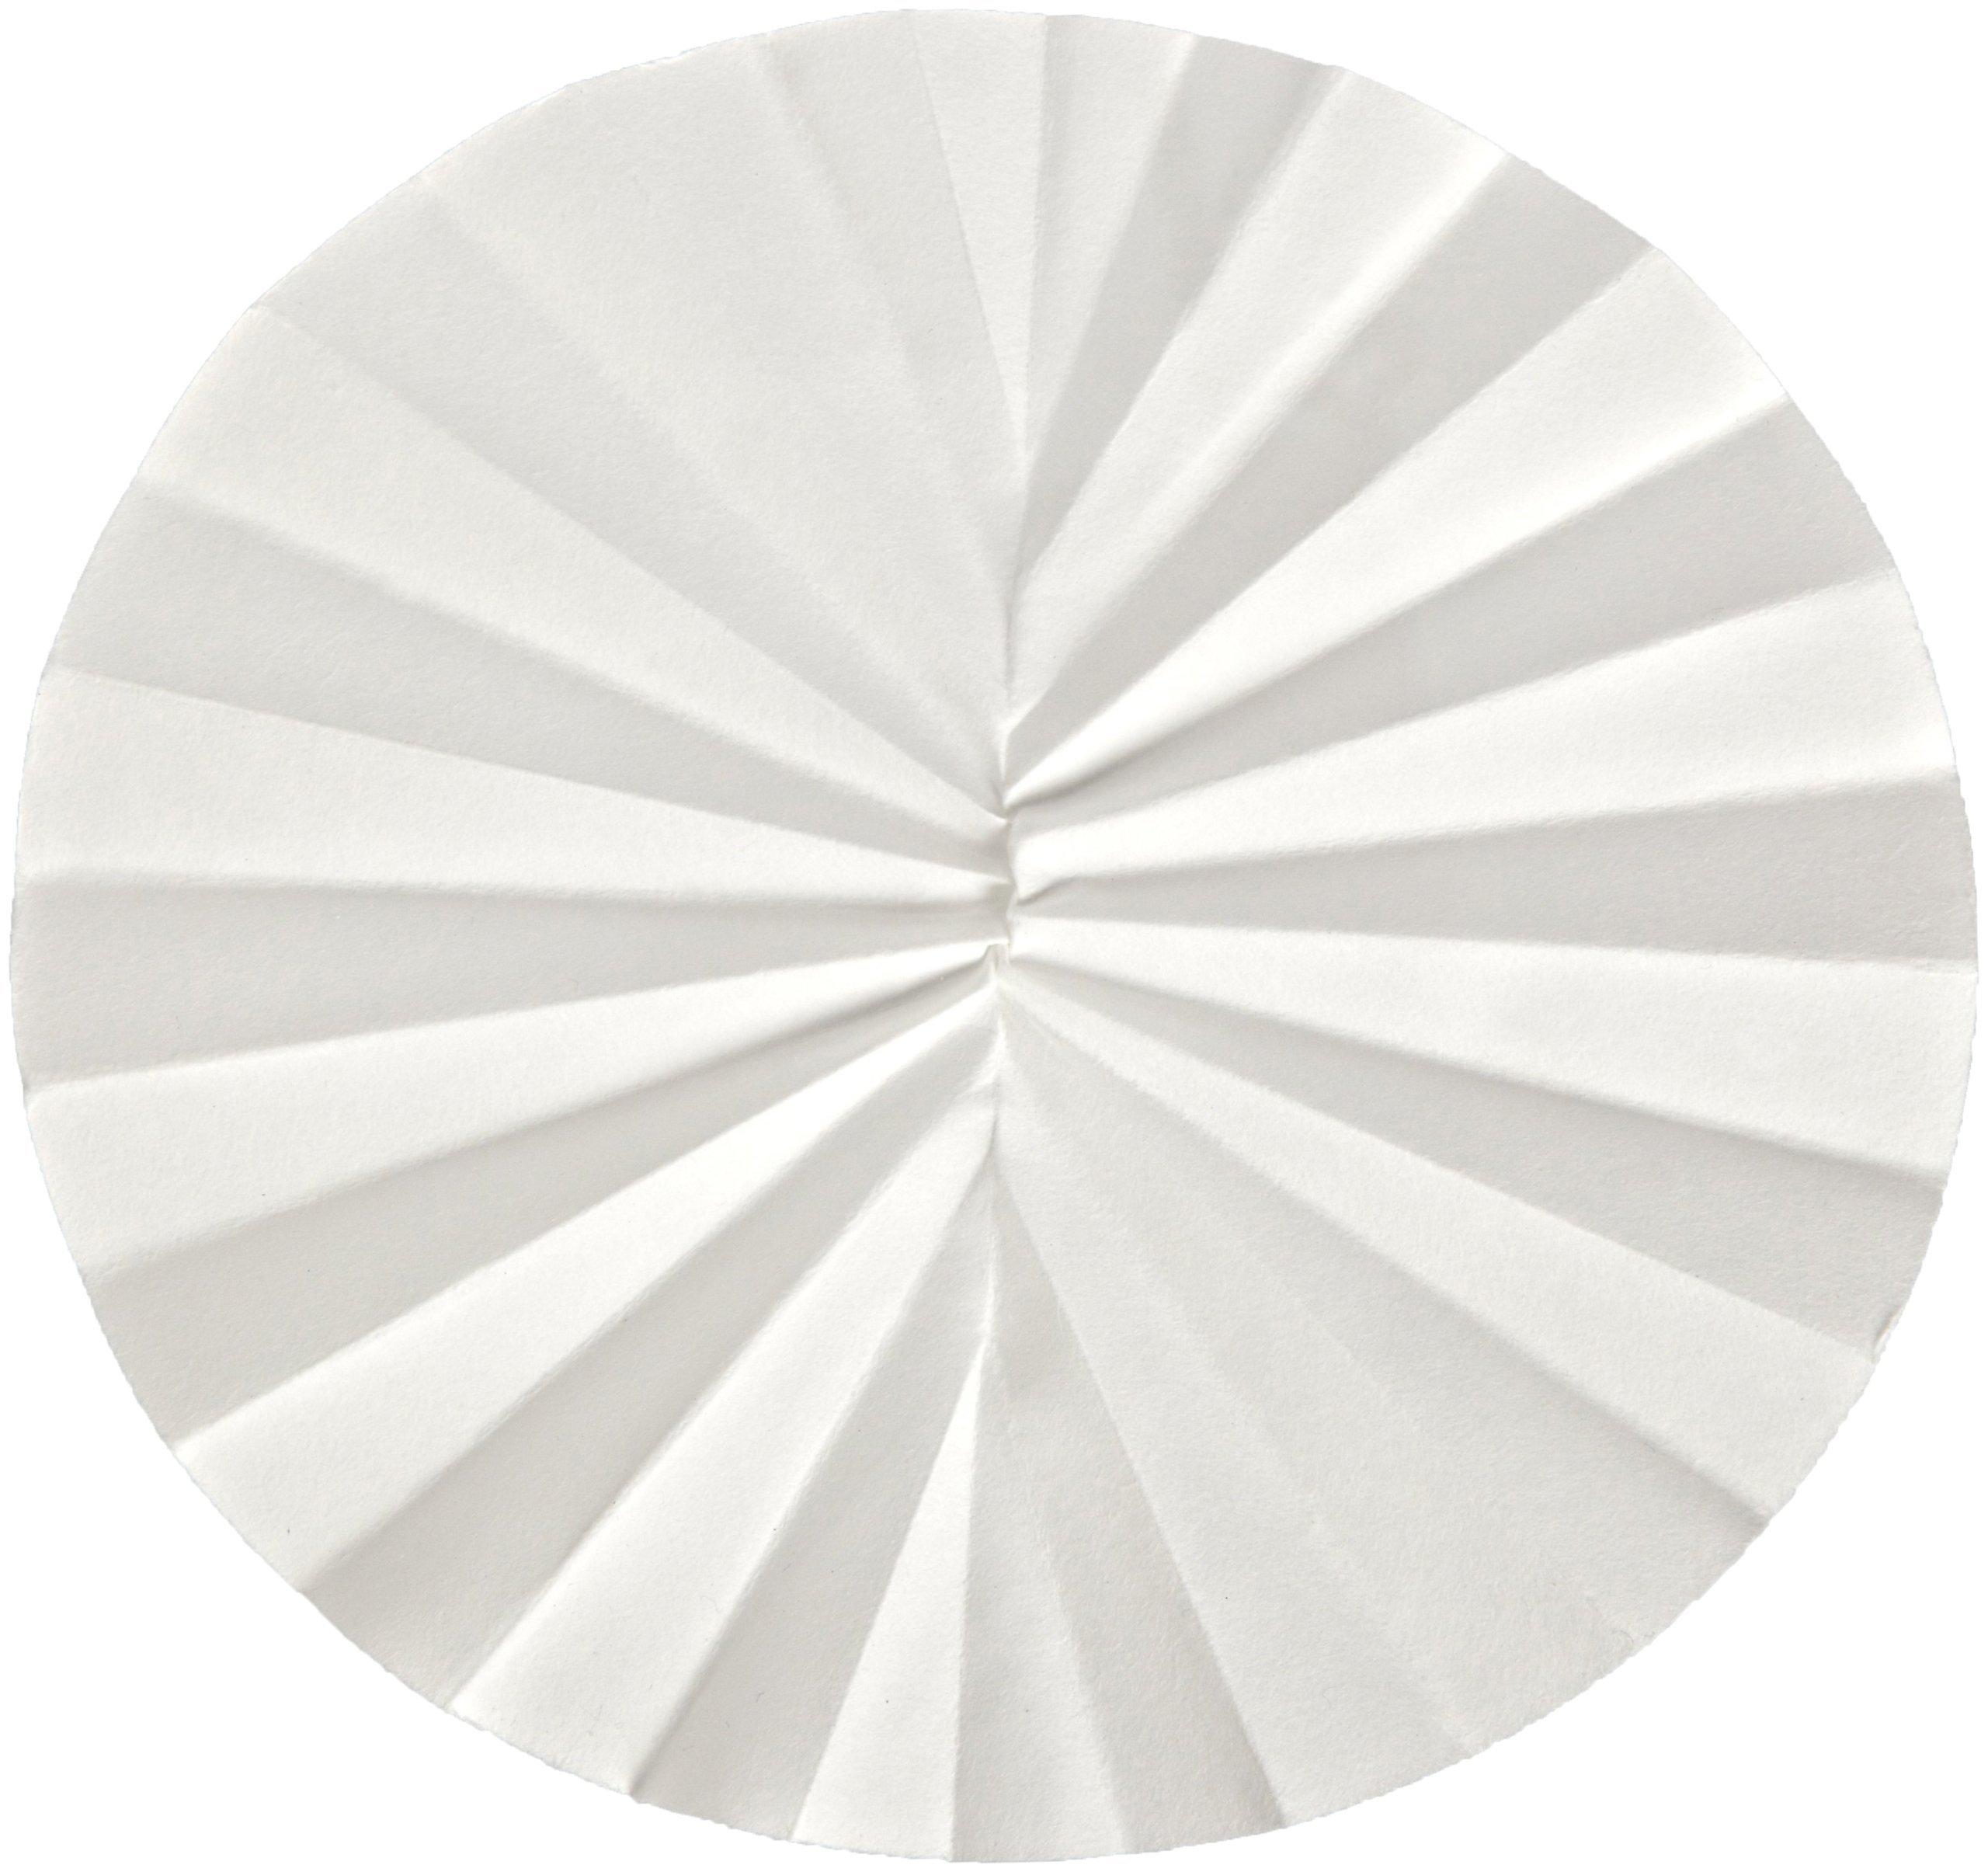 Whatman 10300145 Quantitative Folded Filter Paper, 4-12 Micron, Grade 589/2-1/2, 150mm Diameter (Pack of 100) by Whatman